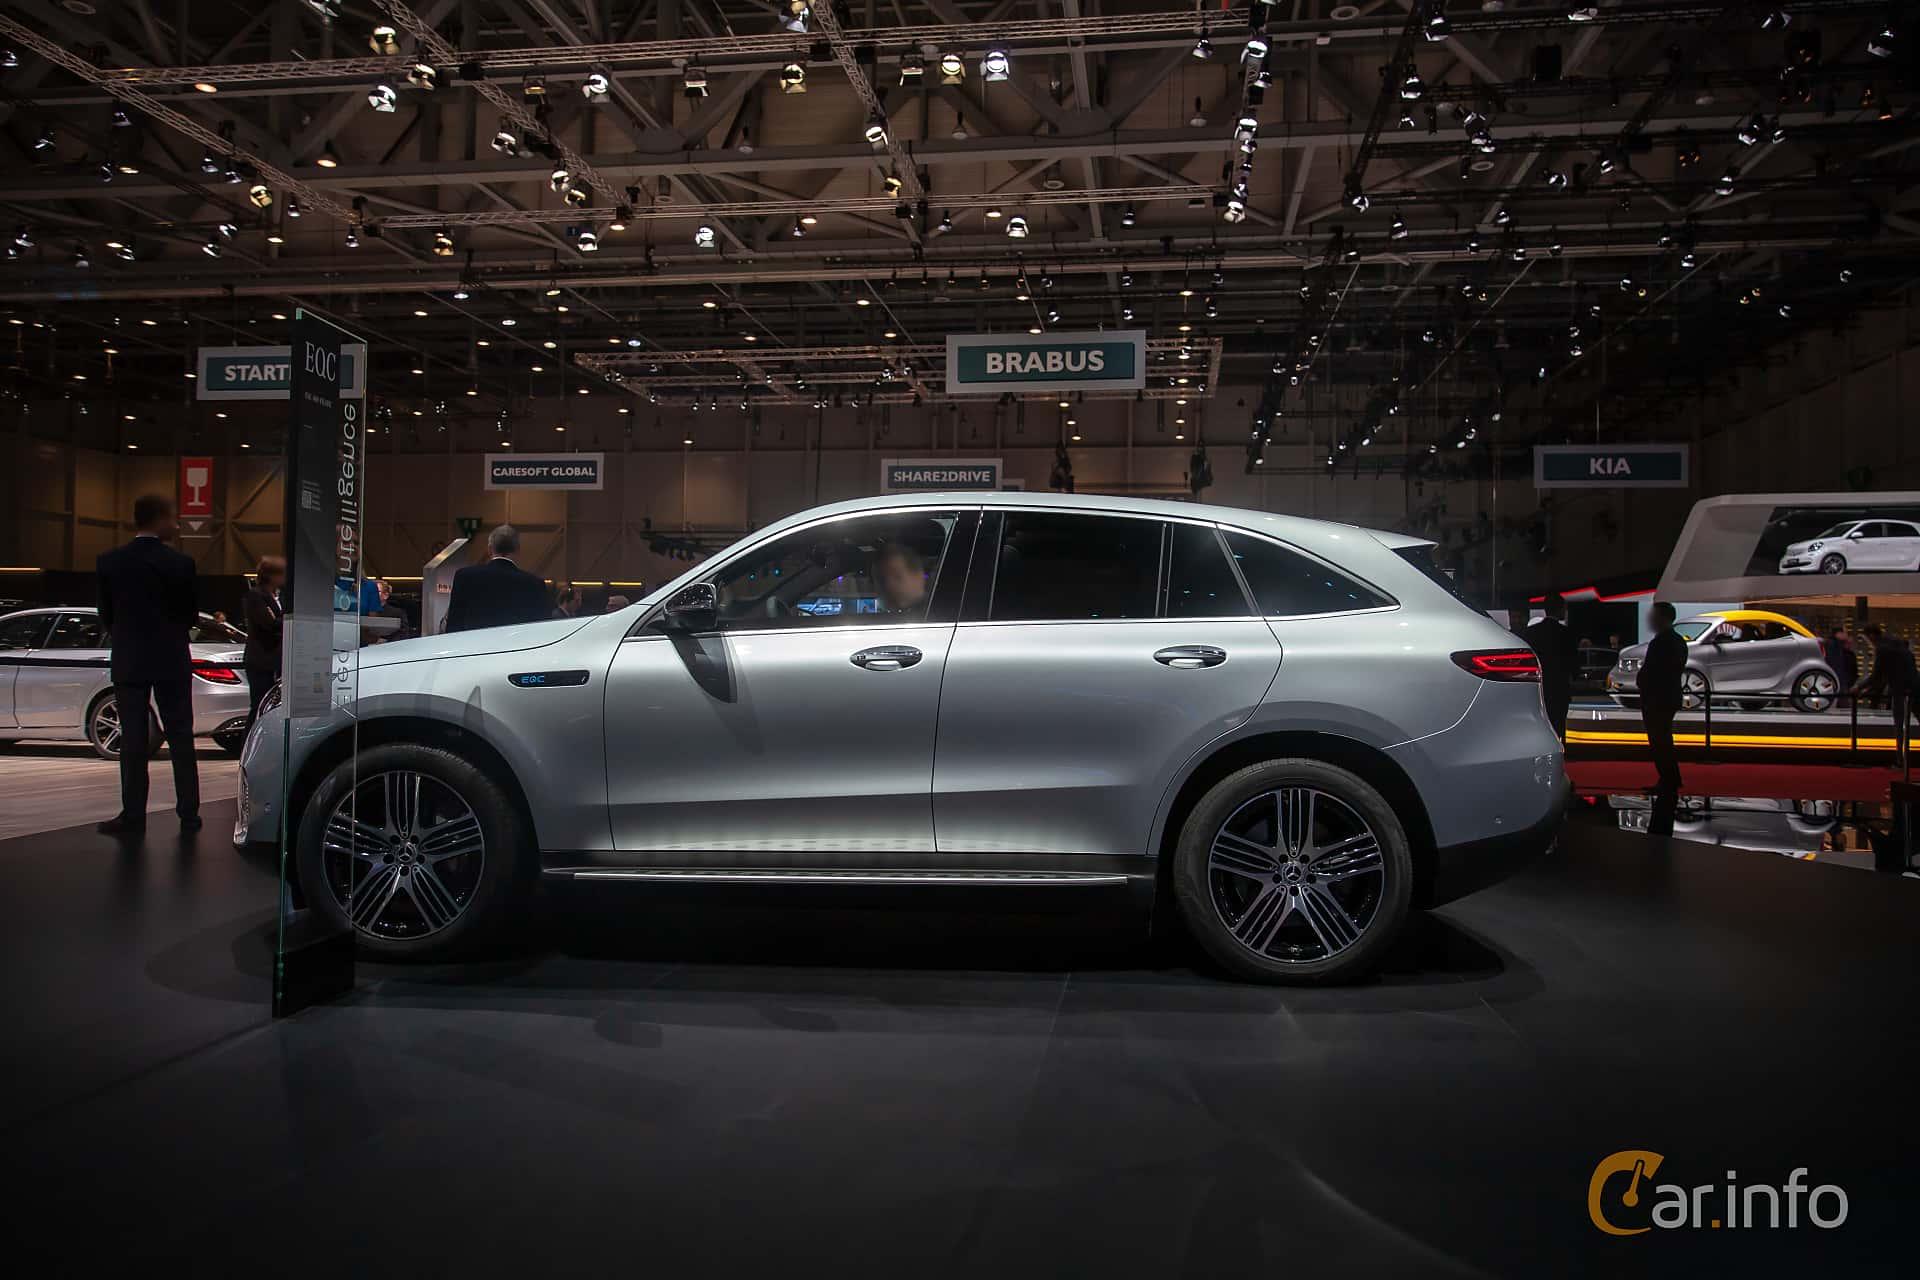 Mercedes-Benz EQC 400  Single Speed, 408hp, 2019 at Geneva Motor Show 2019